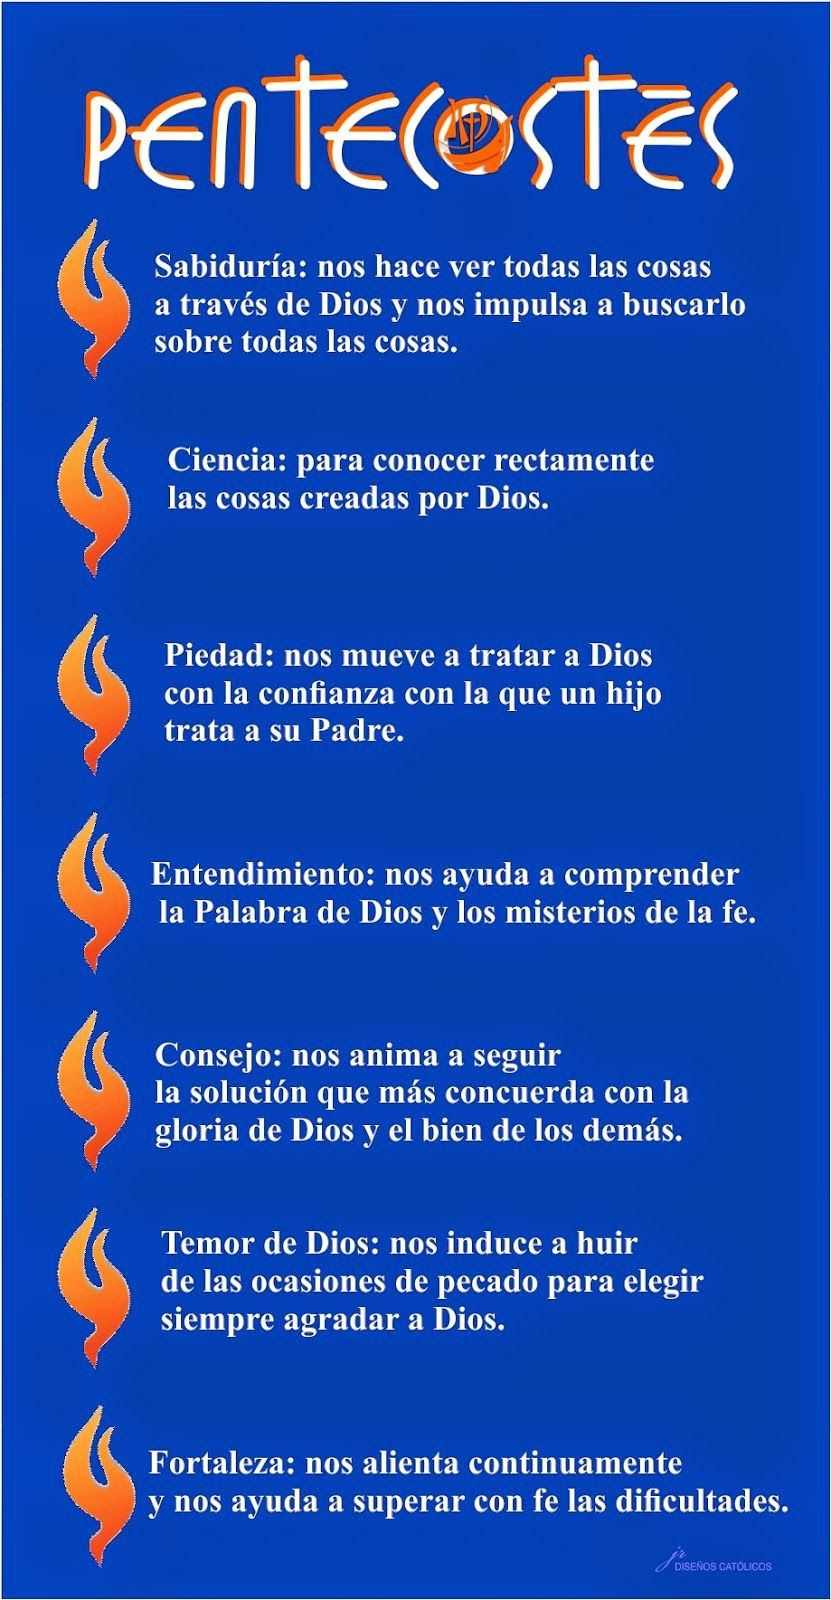 Pentecostés Los Dones Del Espíritu Santo Imagen Dones